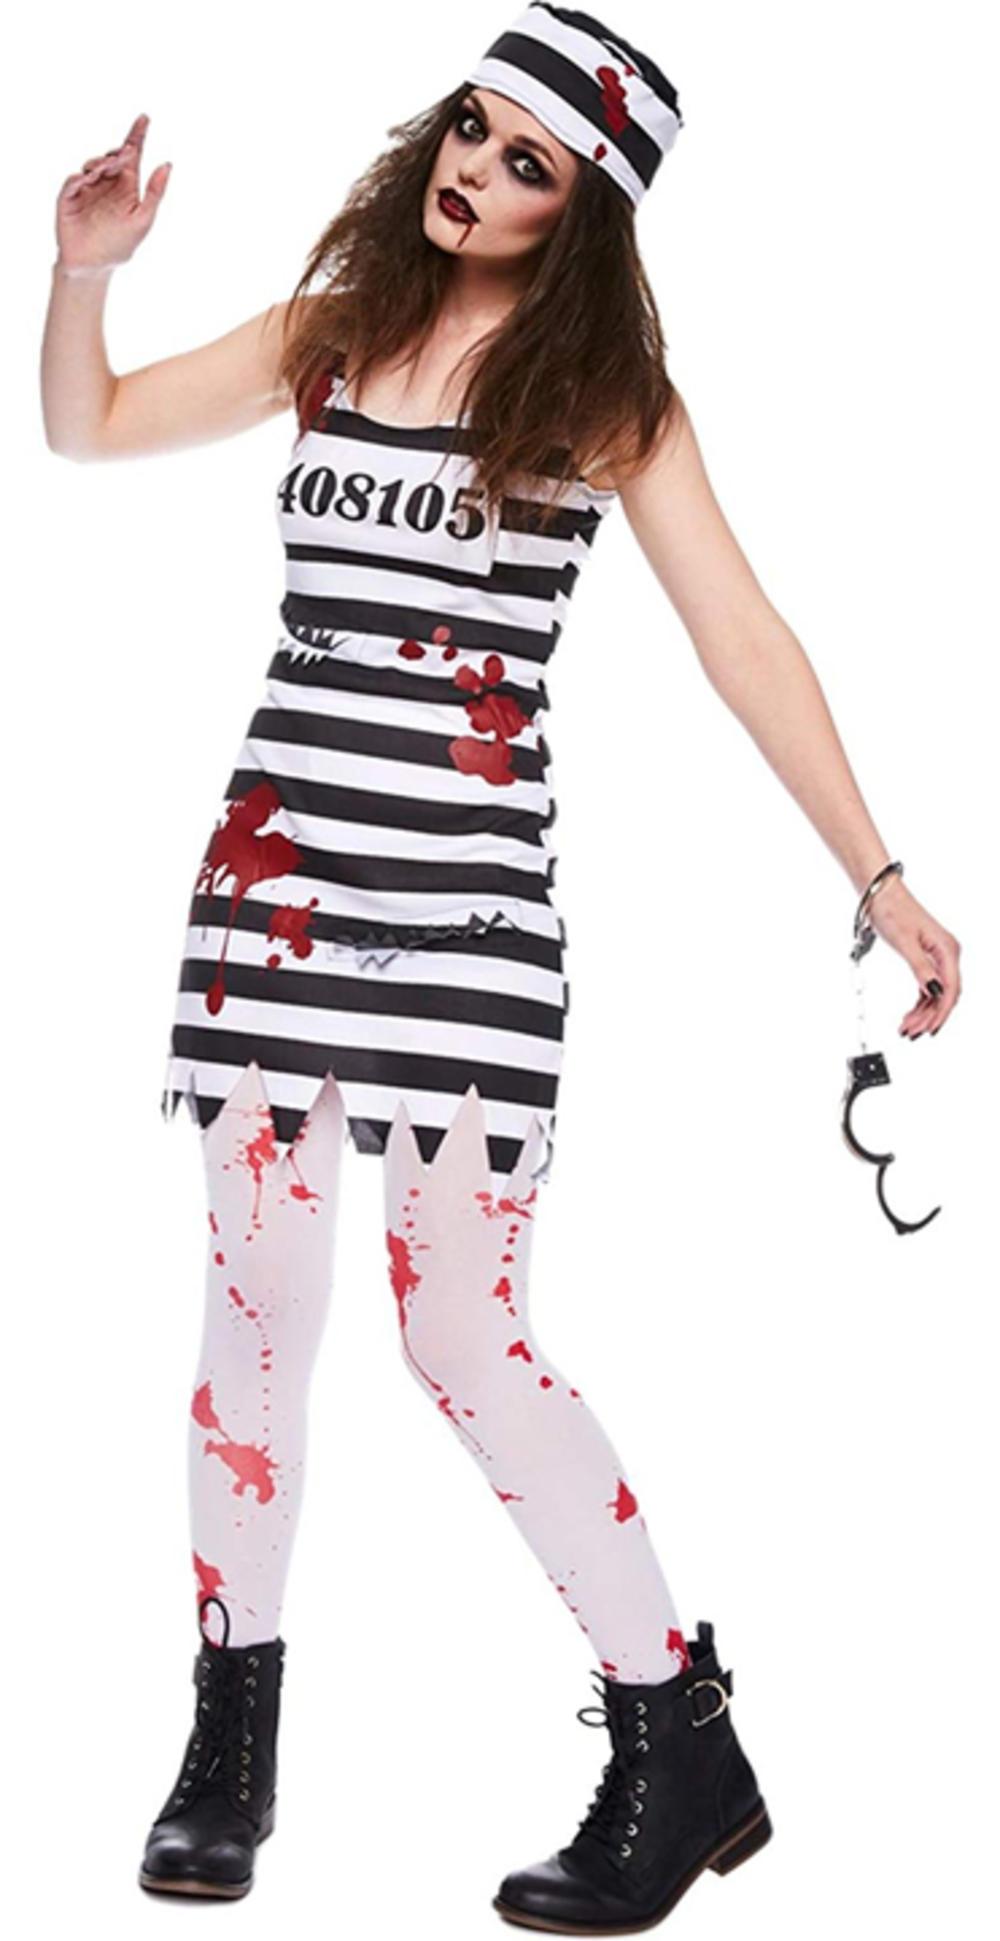 Zombie Convict Ladies Fancy Dress Halloween Prisoner Womens Adult Costume Outfit